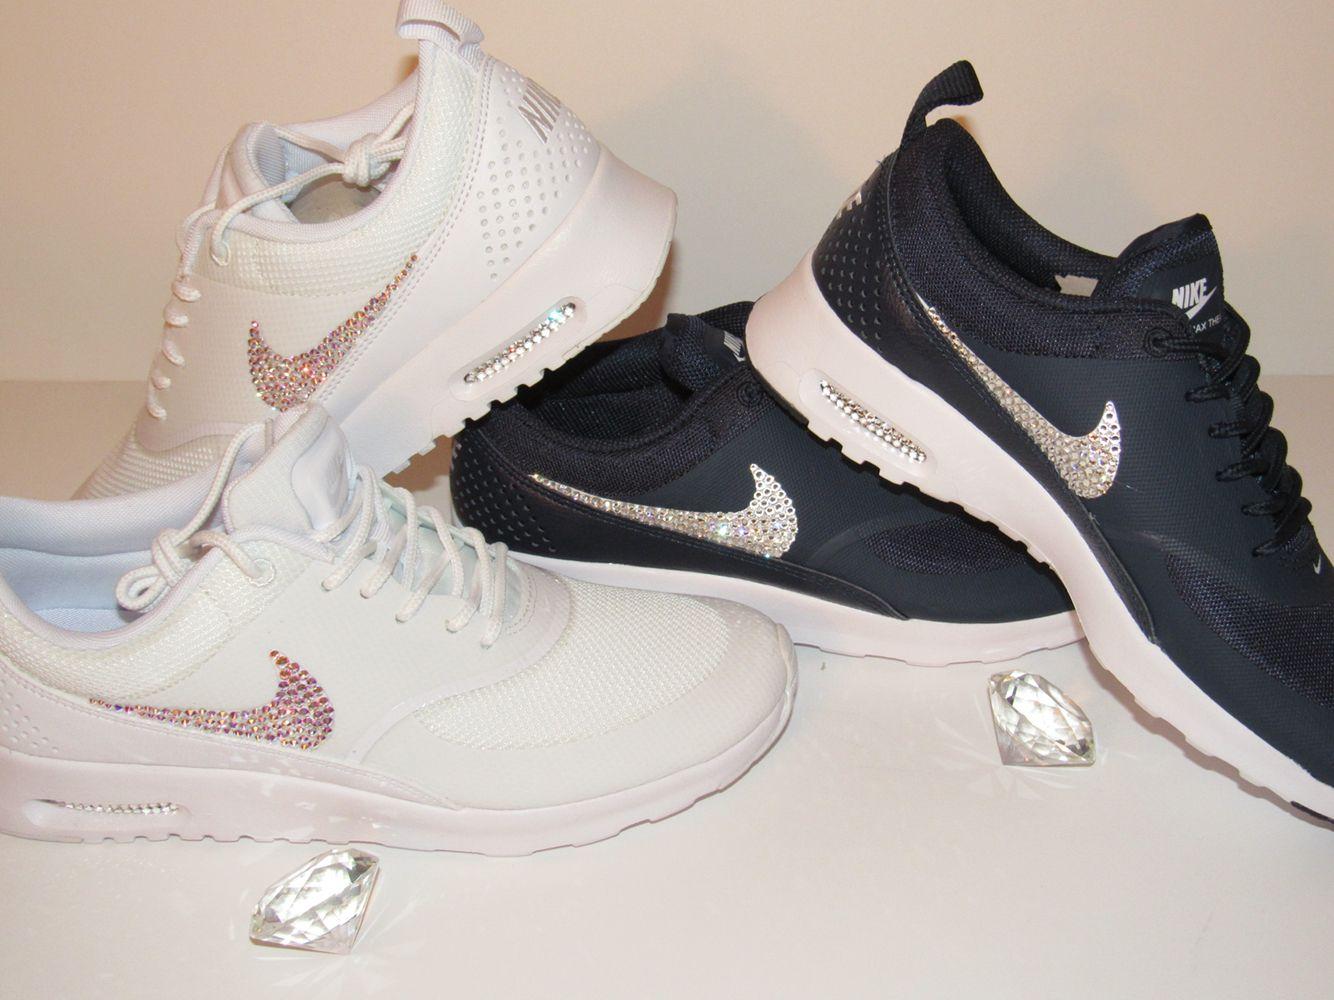 Custom Nike Air Max Thea with Swarovski Crystals